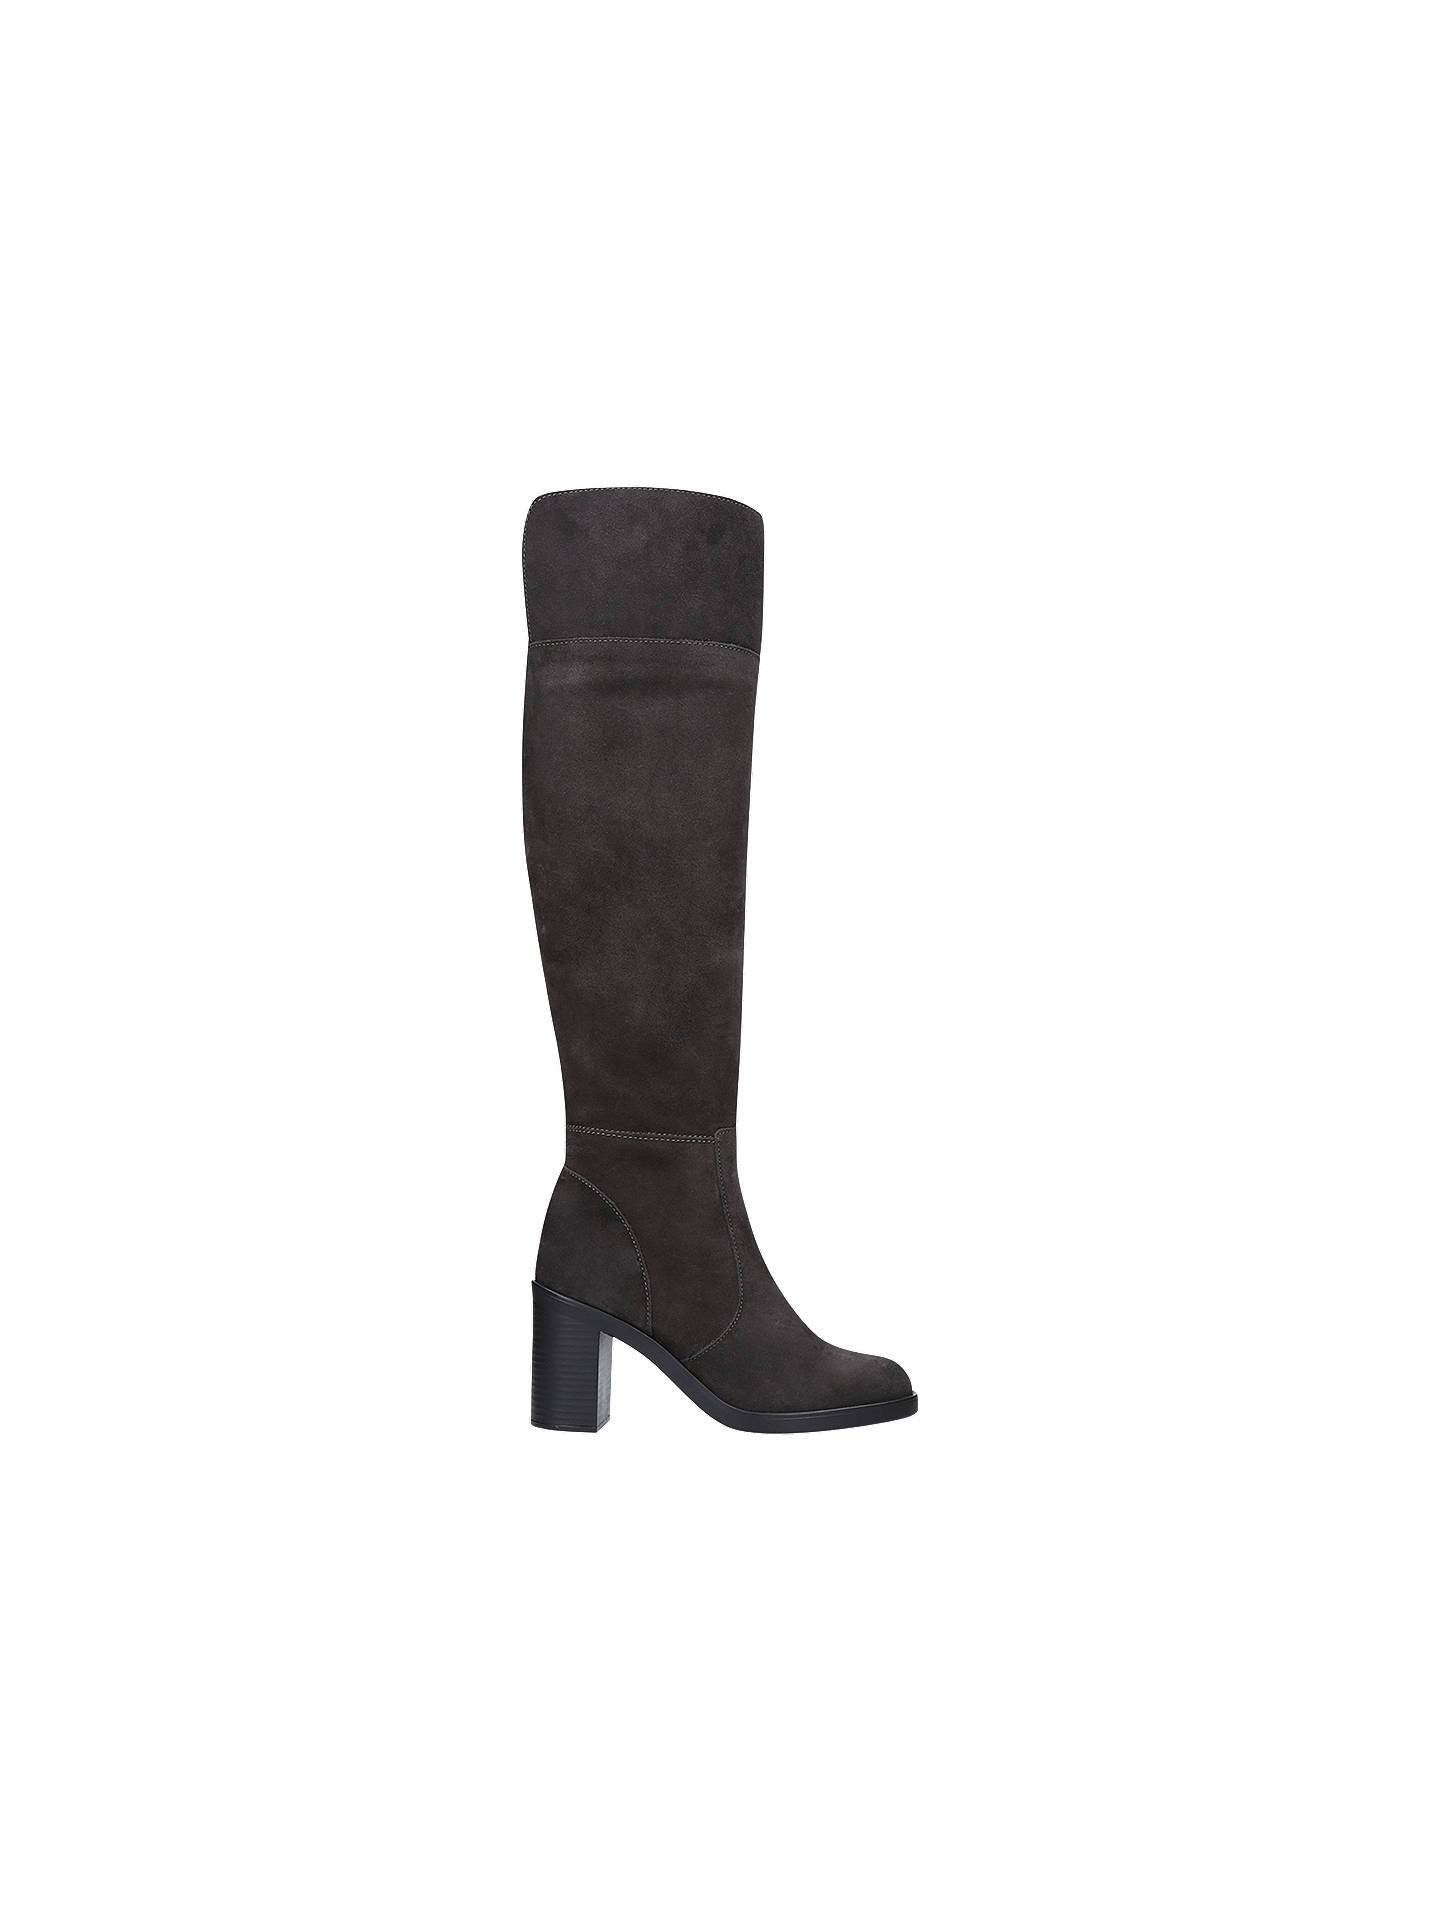 932f4b774e1a8 Buy Kurt Geiger London Tring Block Heel Over the Knee Boots